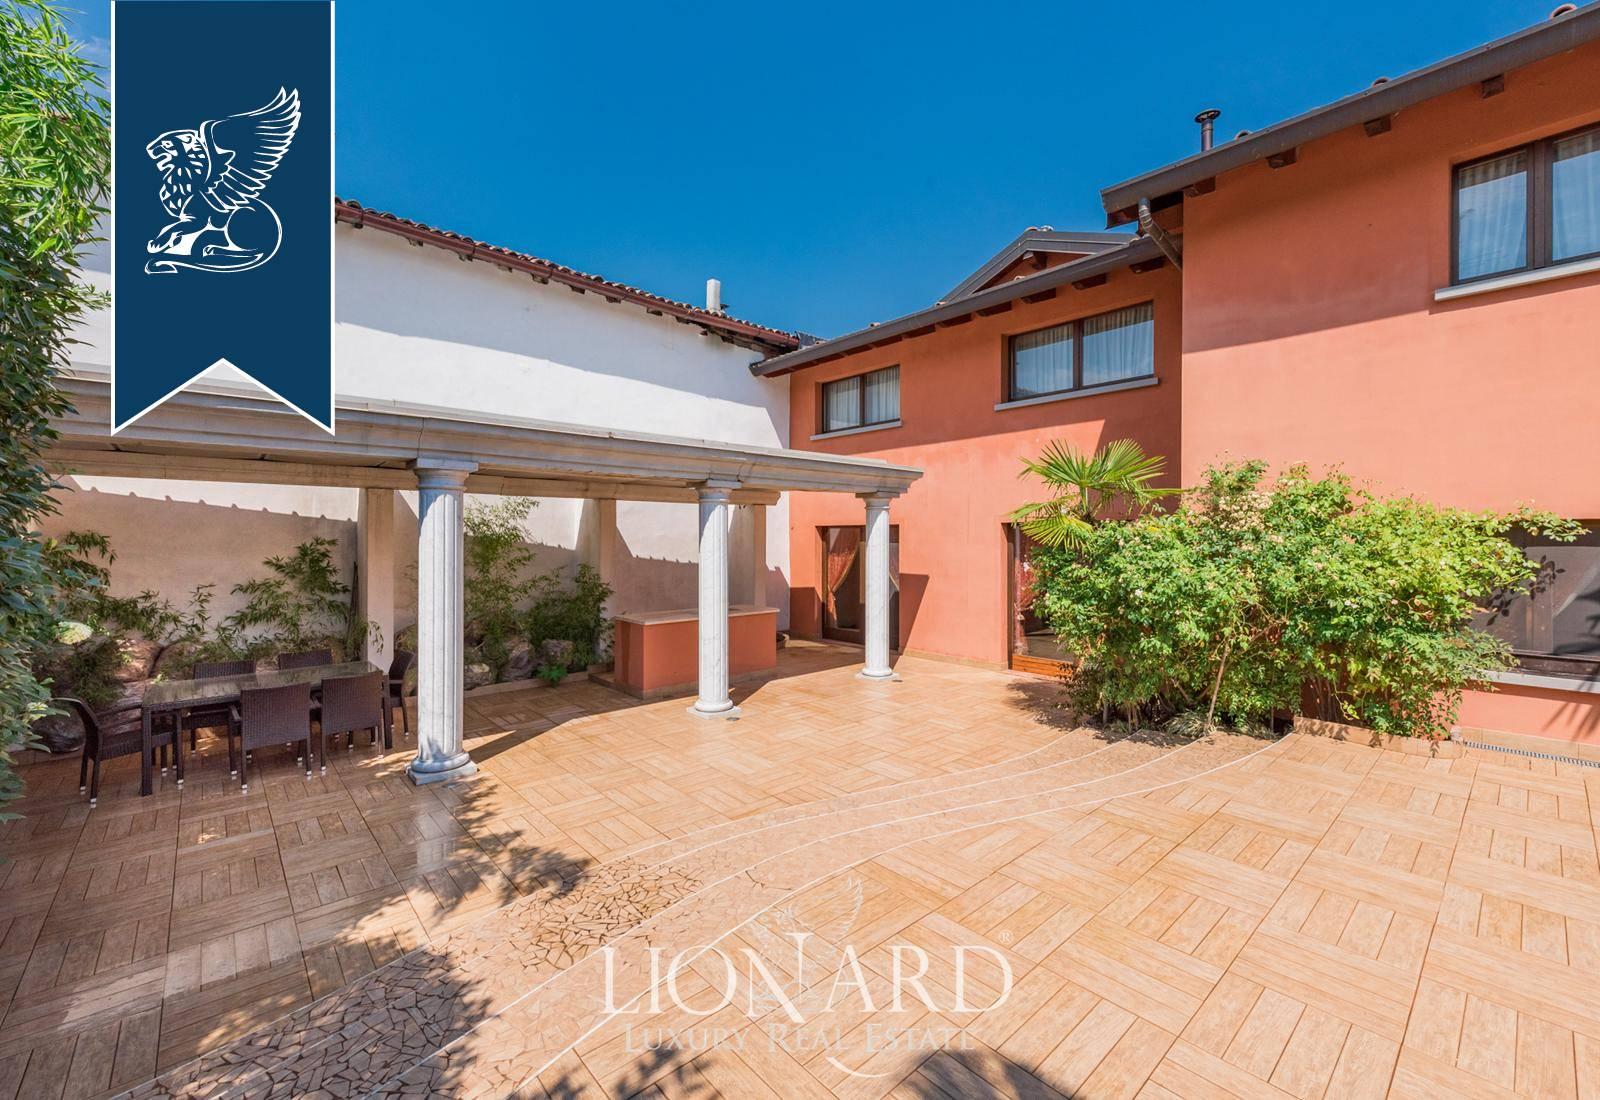 Villa in Vendita a Fara Gera D'Adda: 0 locali, 1350 mq - Foto 7